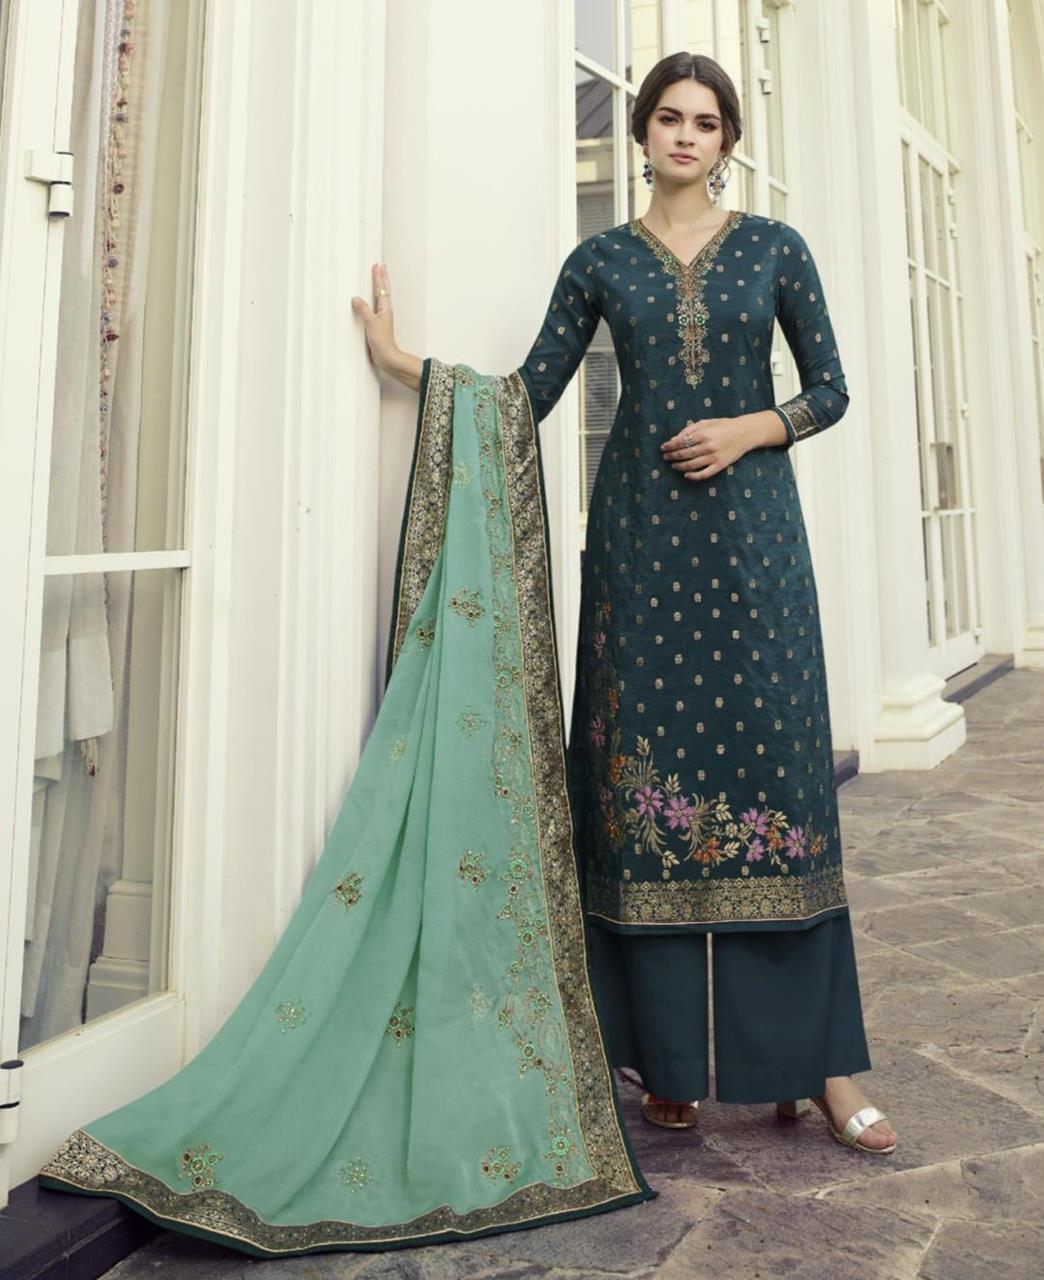 HandWorked Jacquard Straight cut Salwar Kameez in Teal Blue